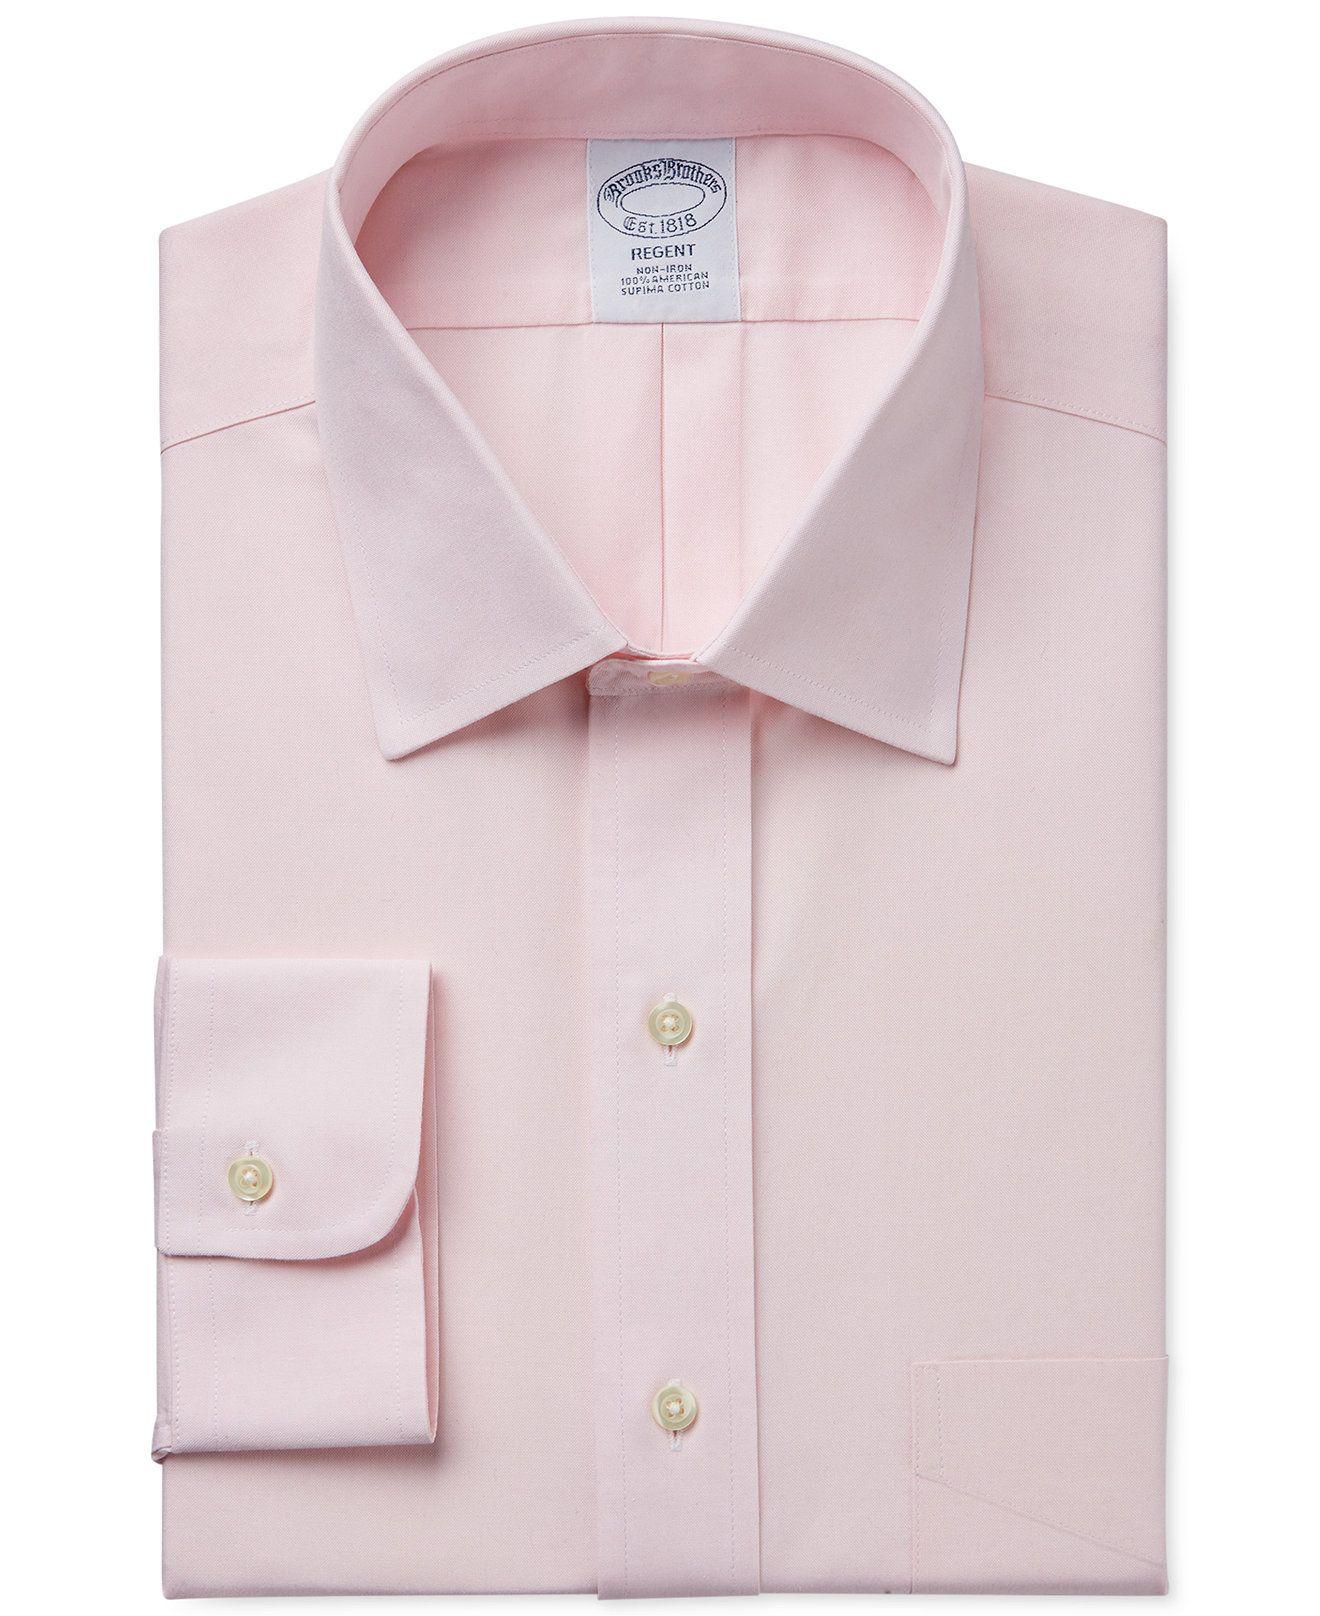 8e0ec1bc Brooks Brothers Regent Classic-Fit Non-Iron Pinpoint Solid Dress Shirt -  Dress Shirts - Men - Macy's